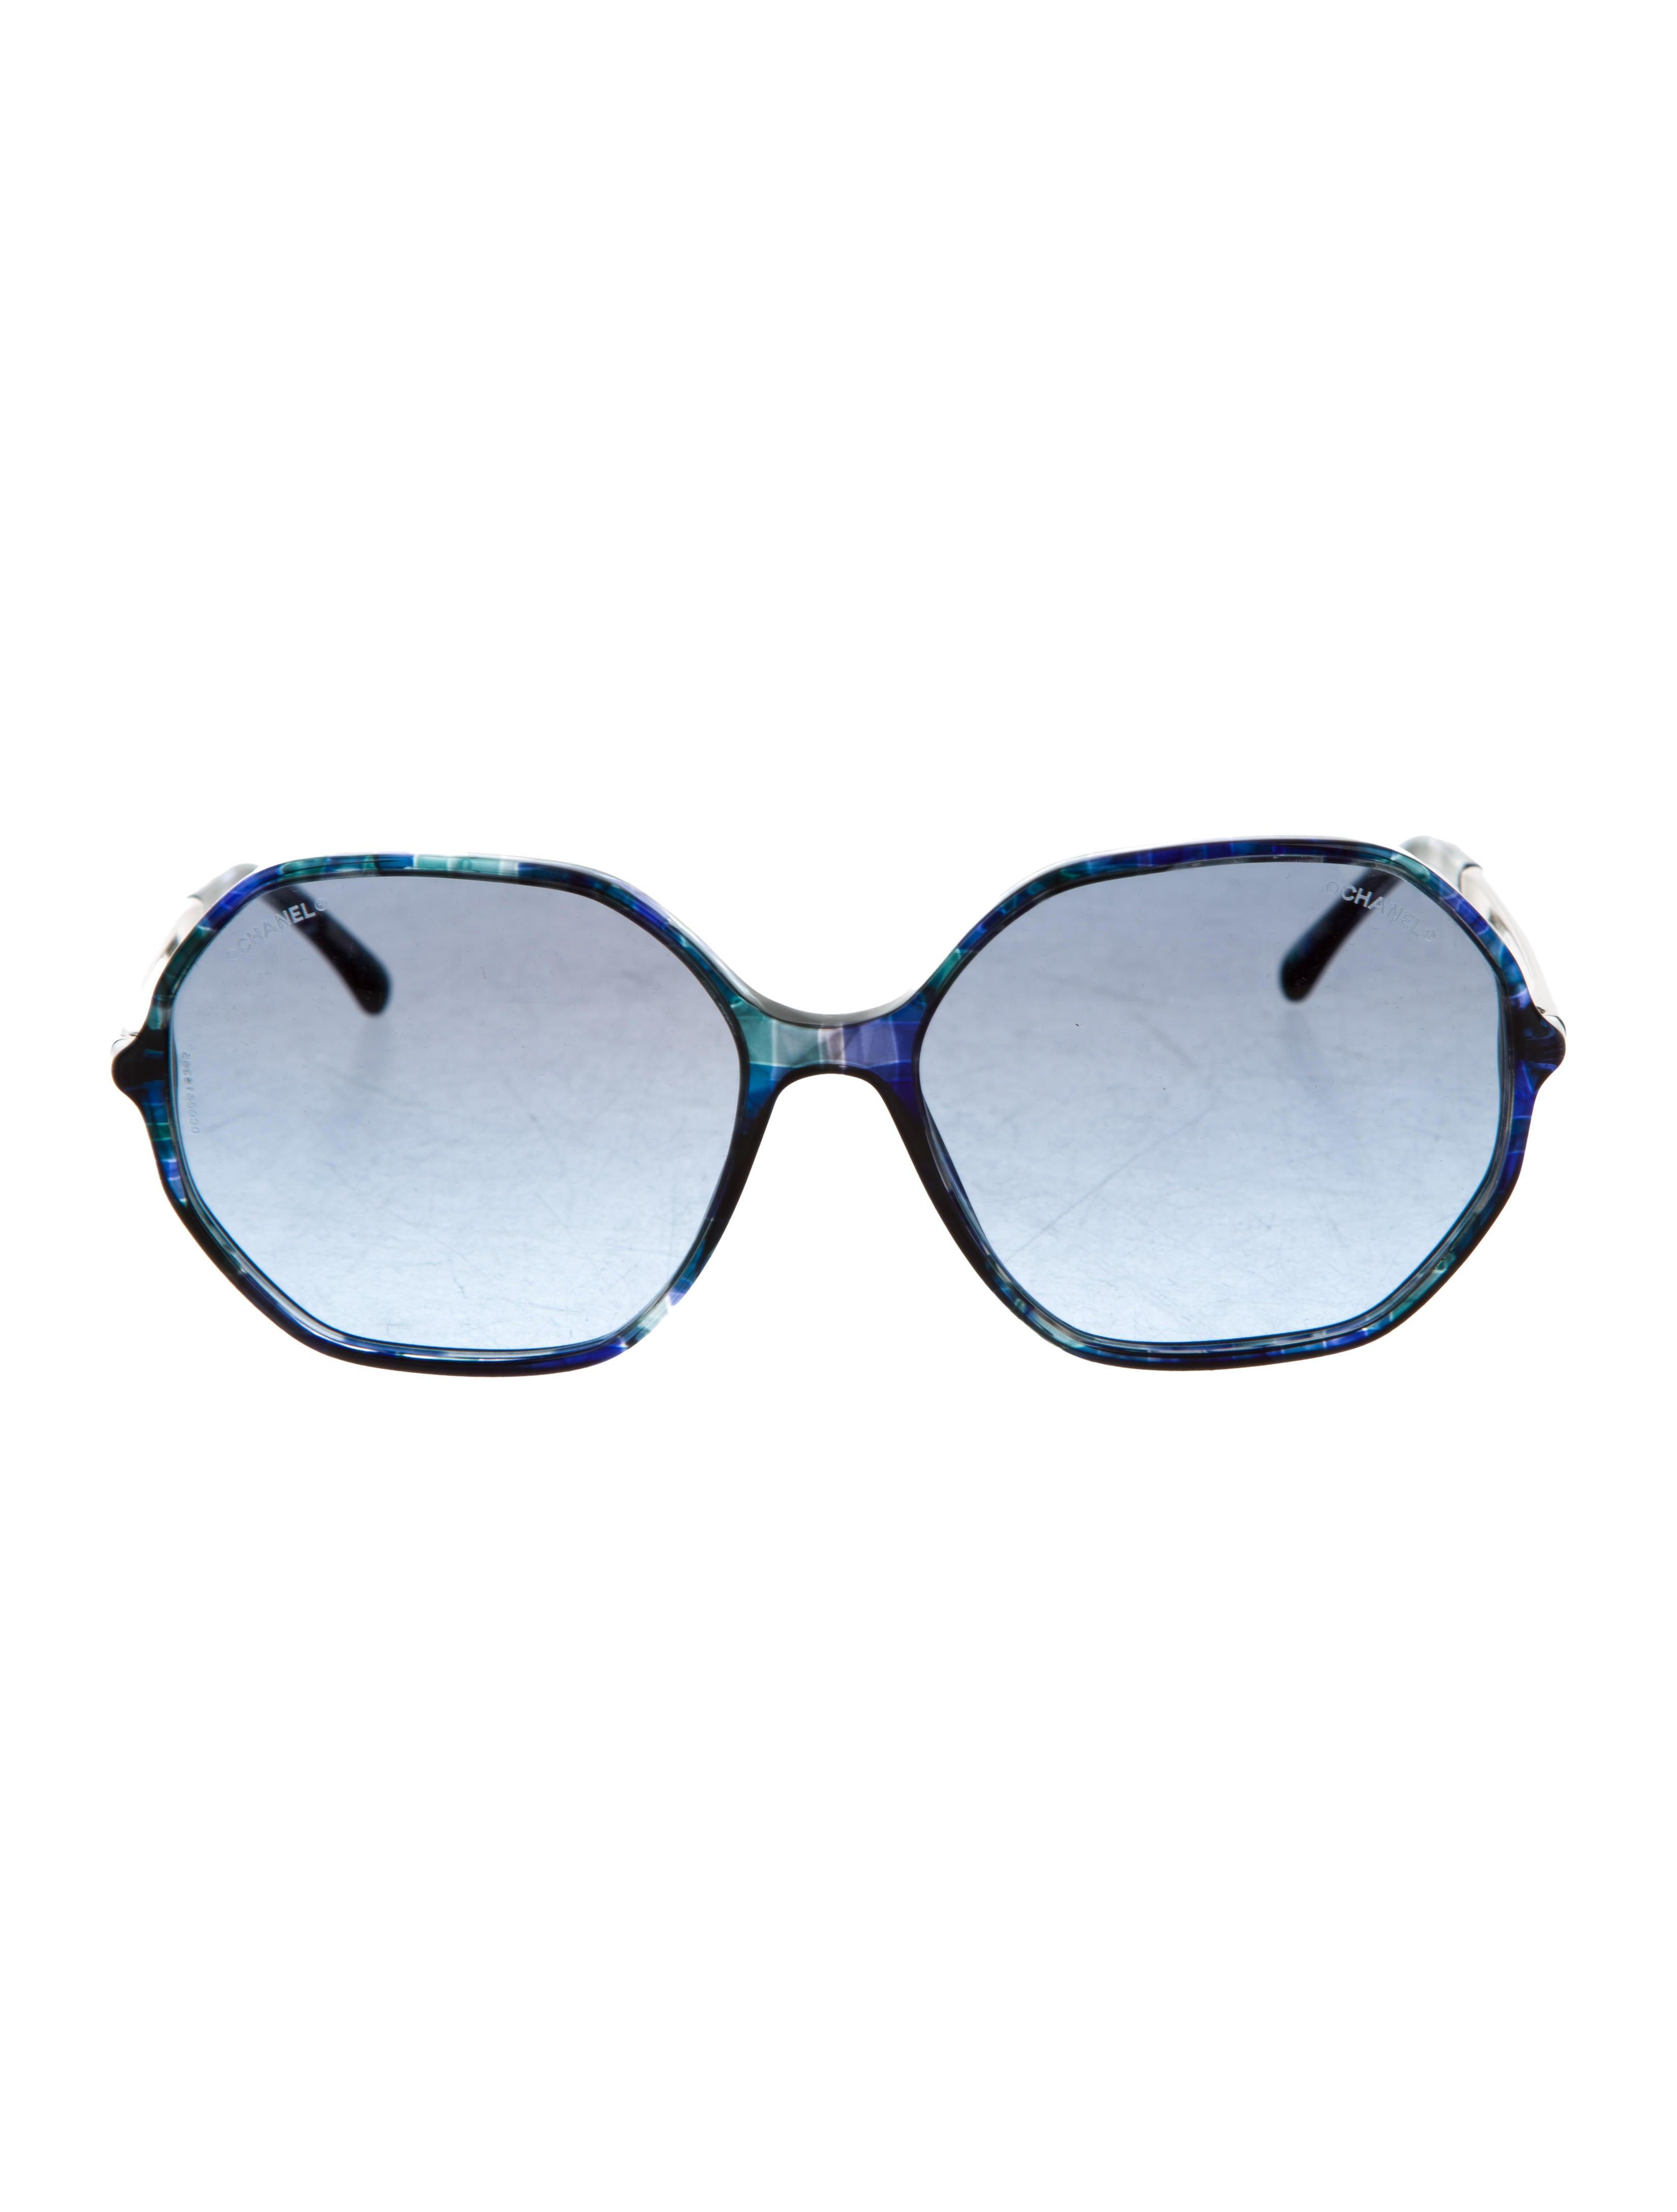 eb8267ec14ca Chanel Round Spring Sunglasses